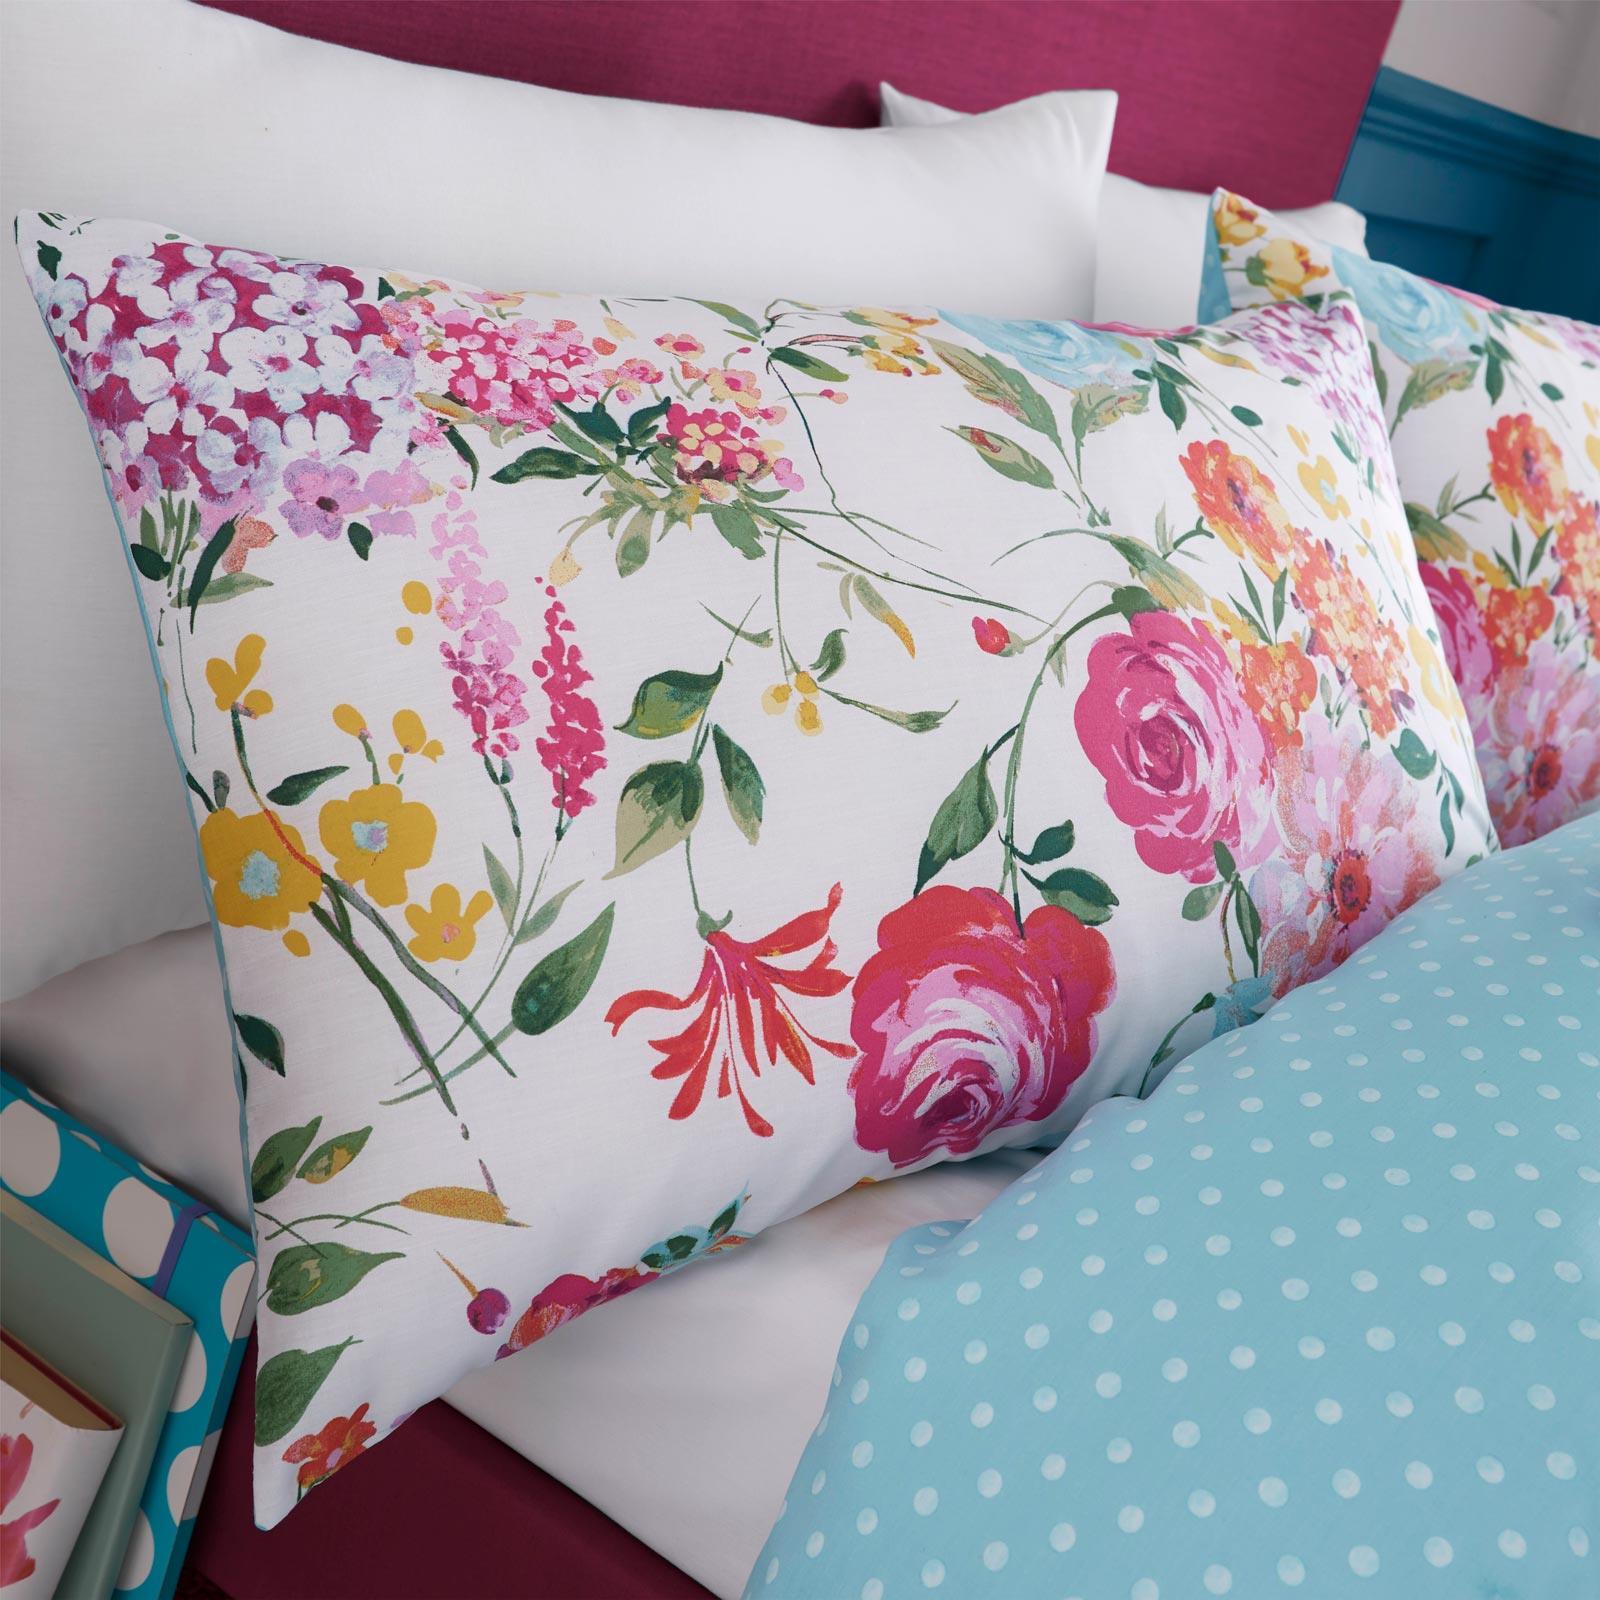 Catherine-Lansfield-Salisbury-Pink-cubierta-del-edredon-edredon-cubre-floral-de-conjuntos-de-cama miniatura 9